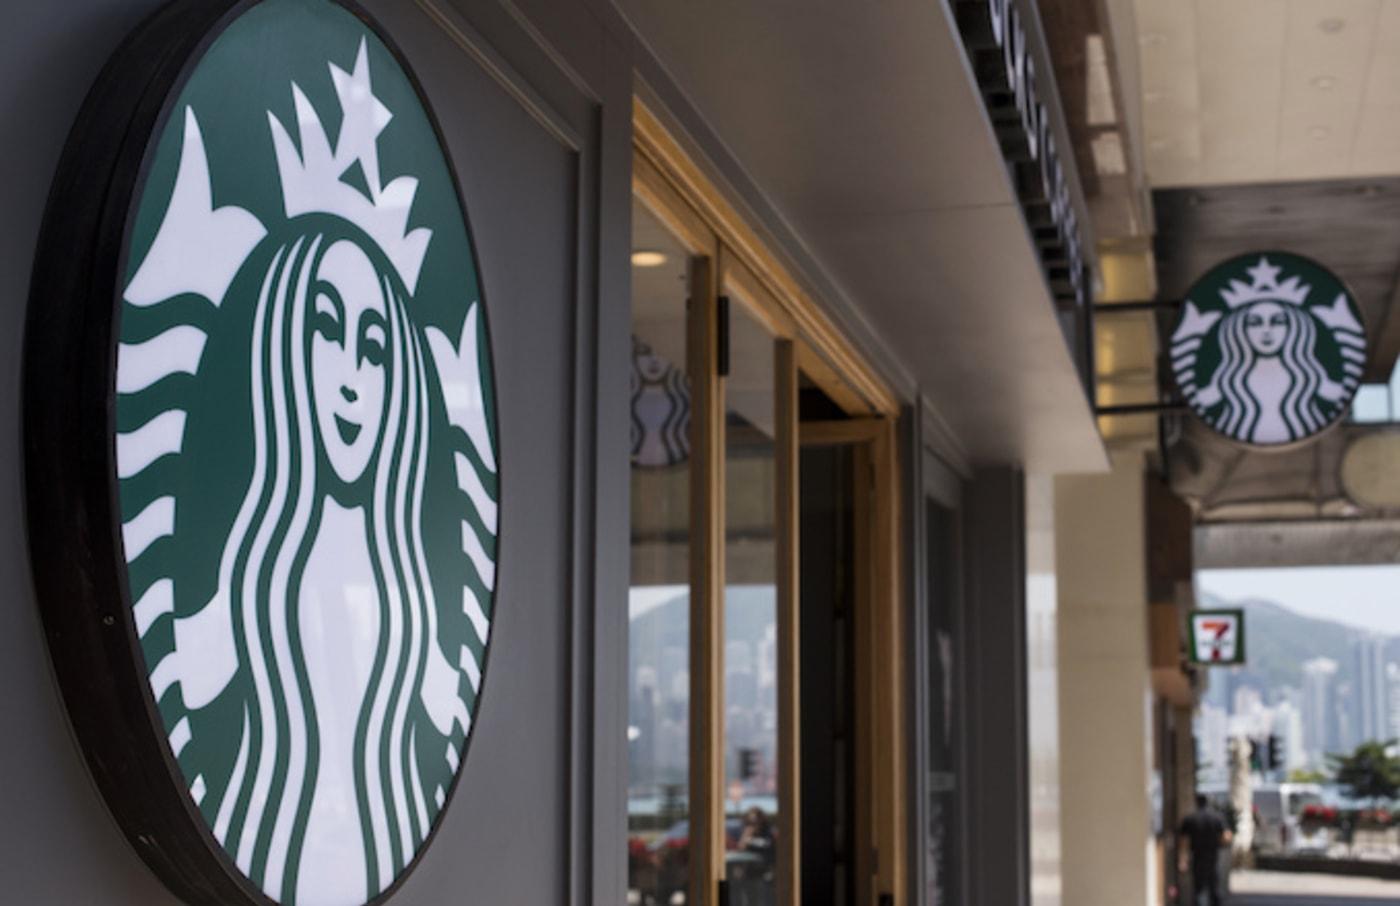 A Starbucks coffee shop